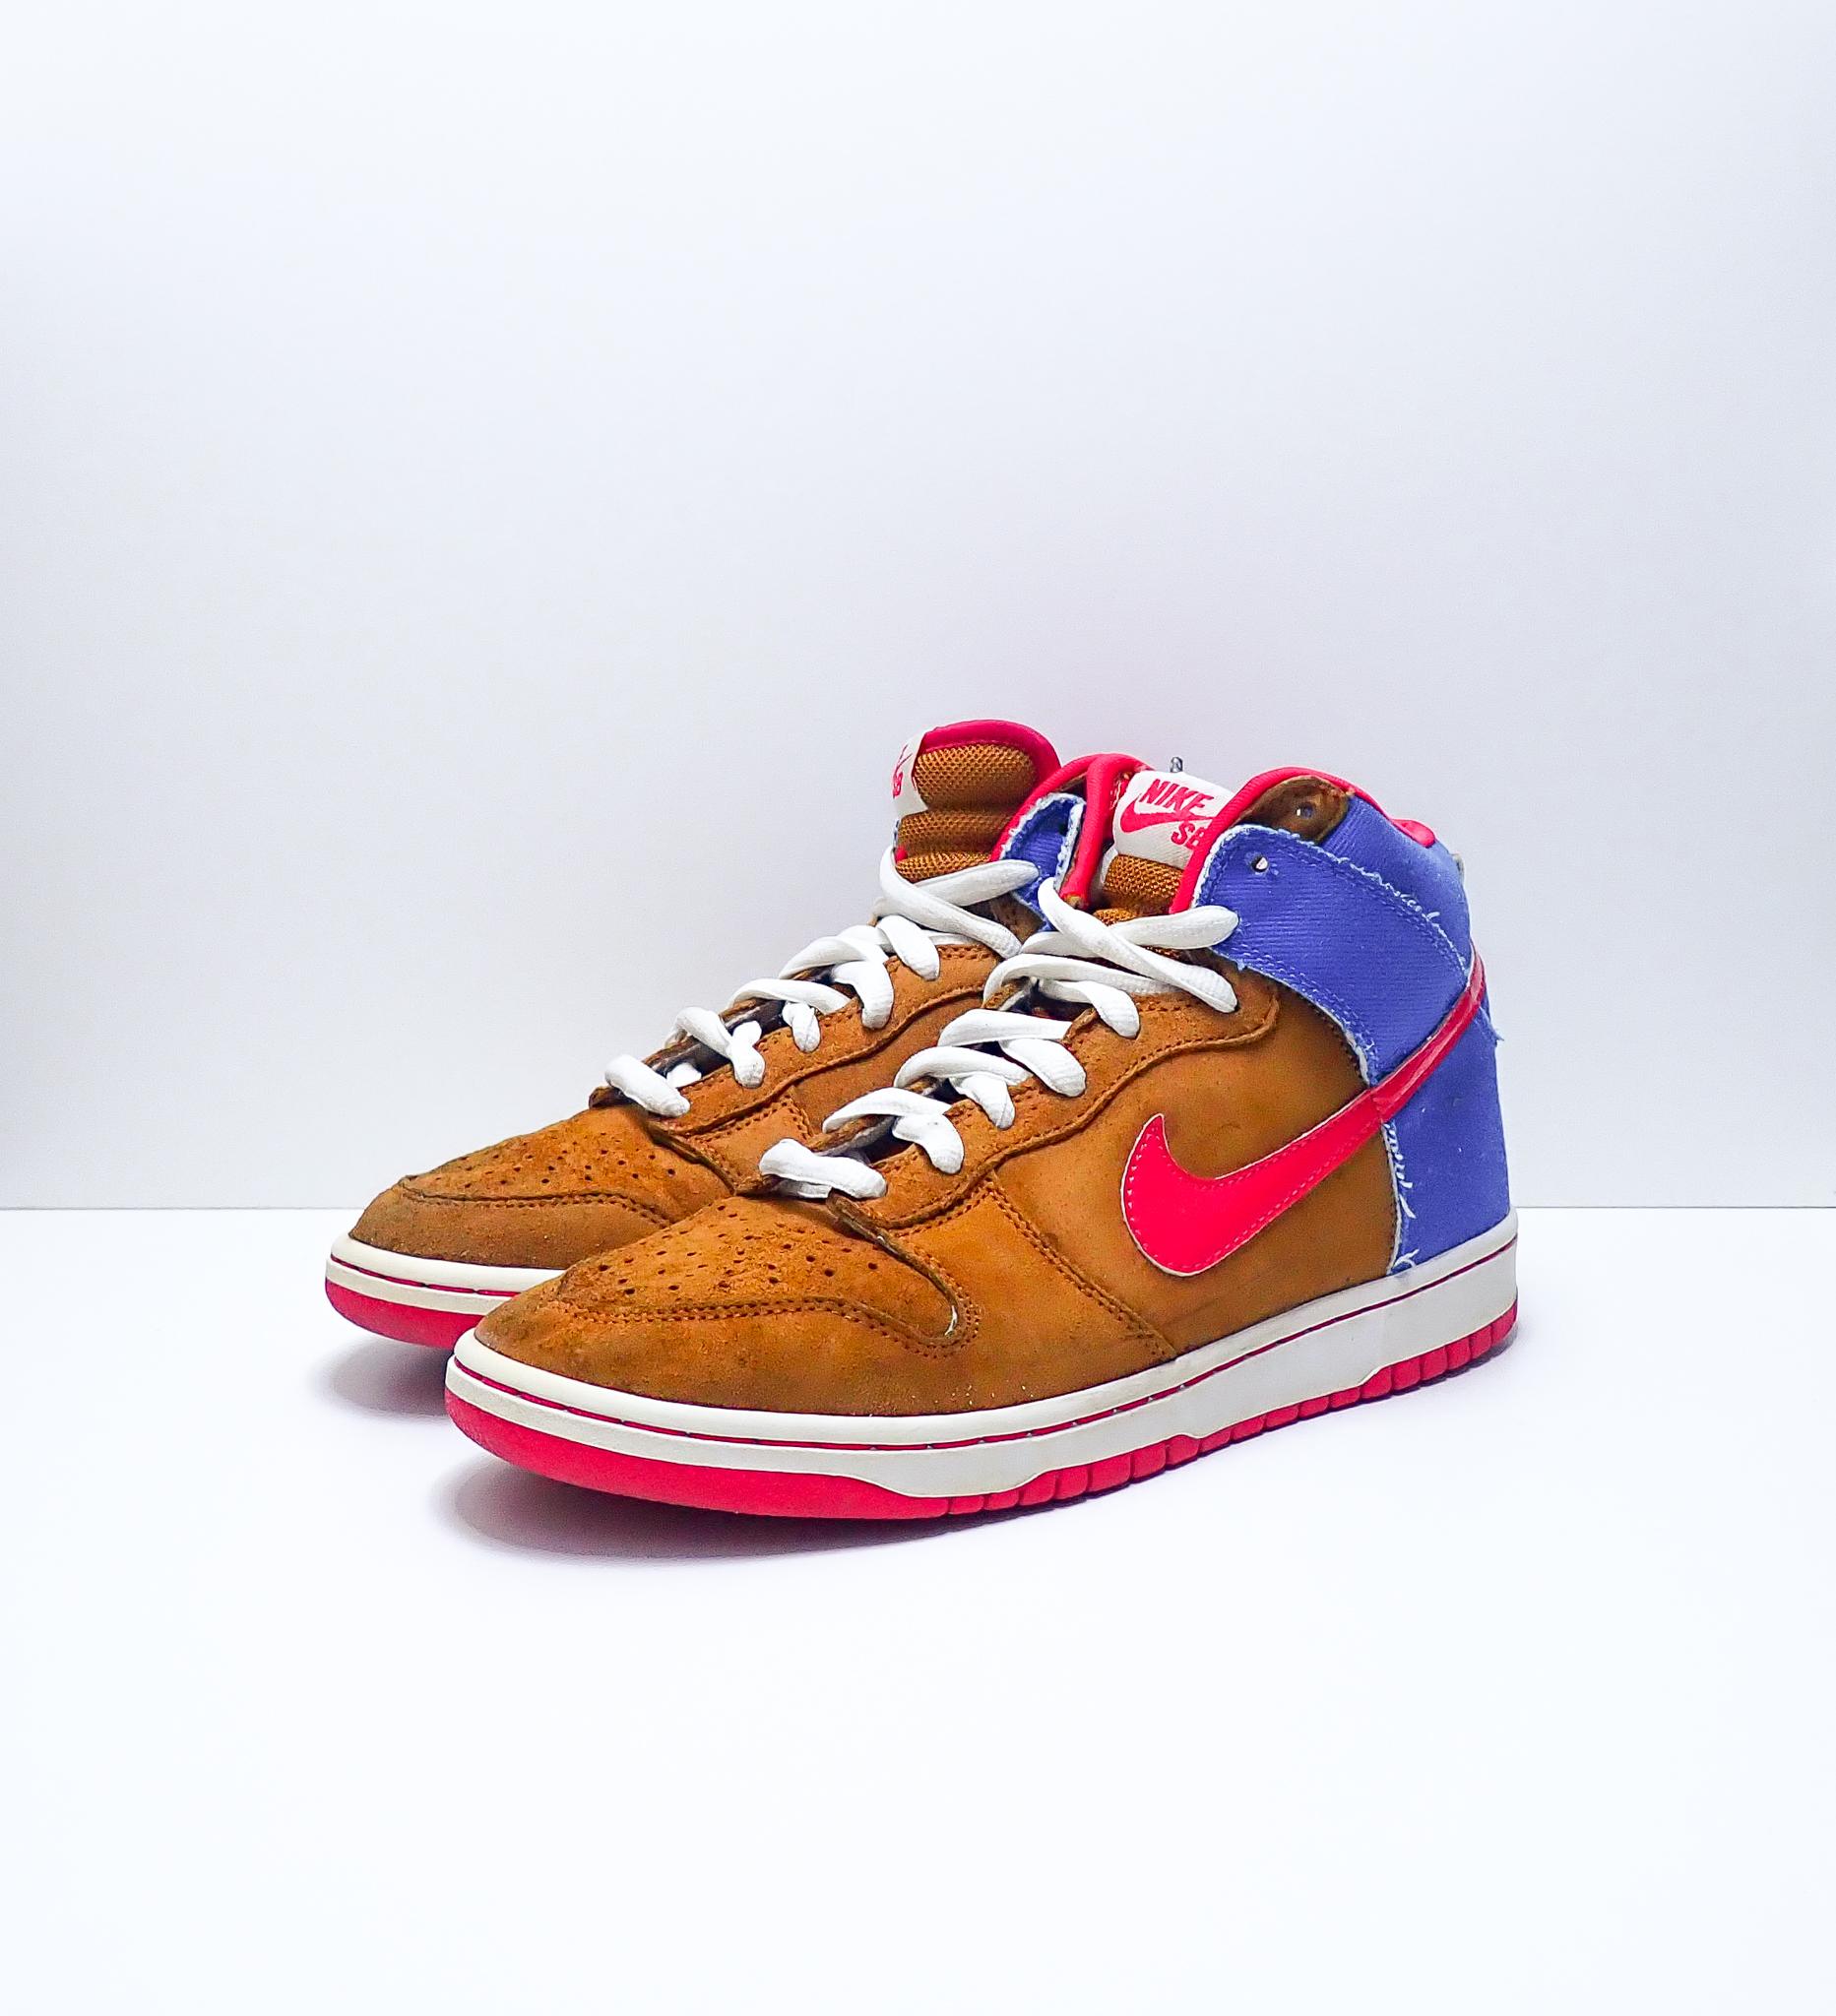 Nike Dunk High Pro SB Mr. Todd Bratrud